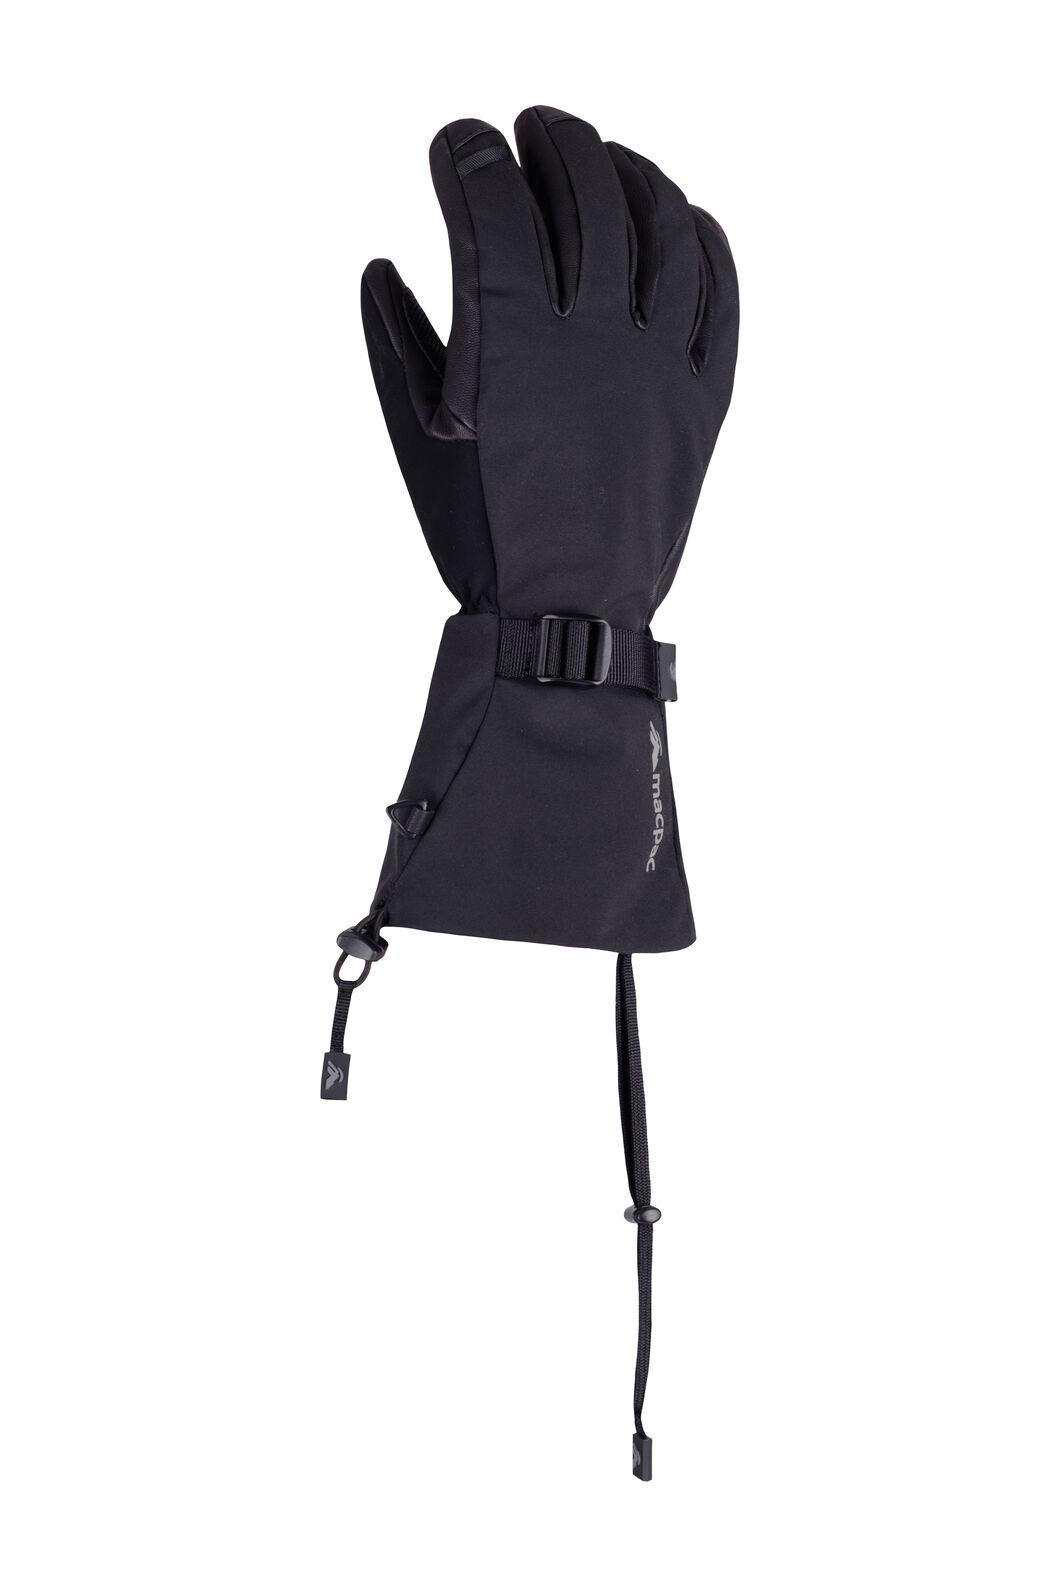 Macpac Powder Reflex™ Gloves, Black, hi-res